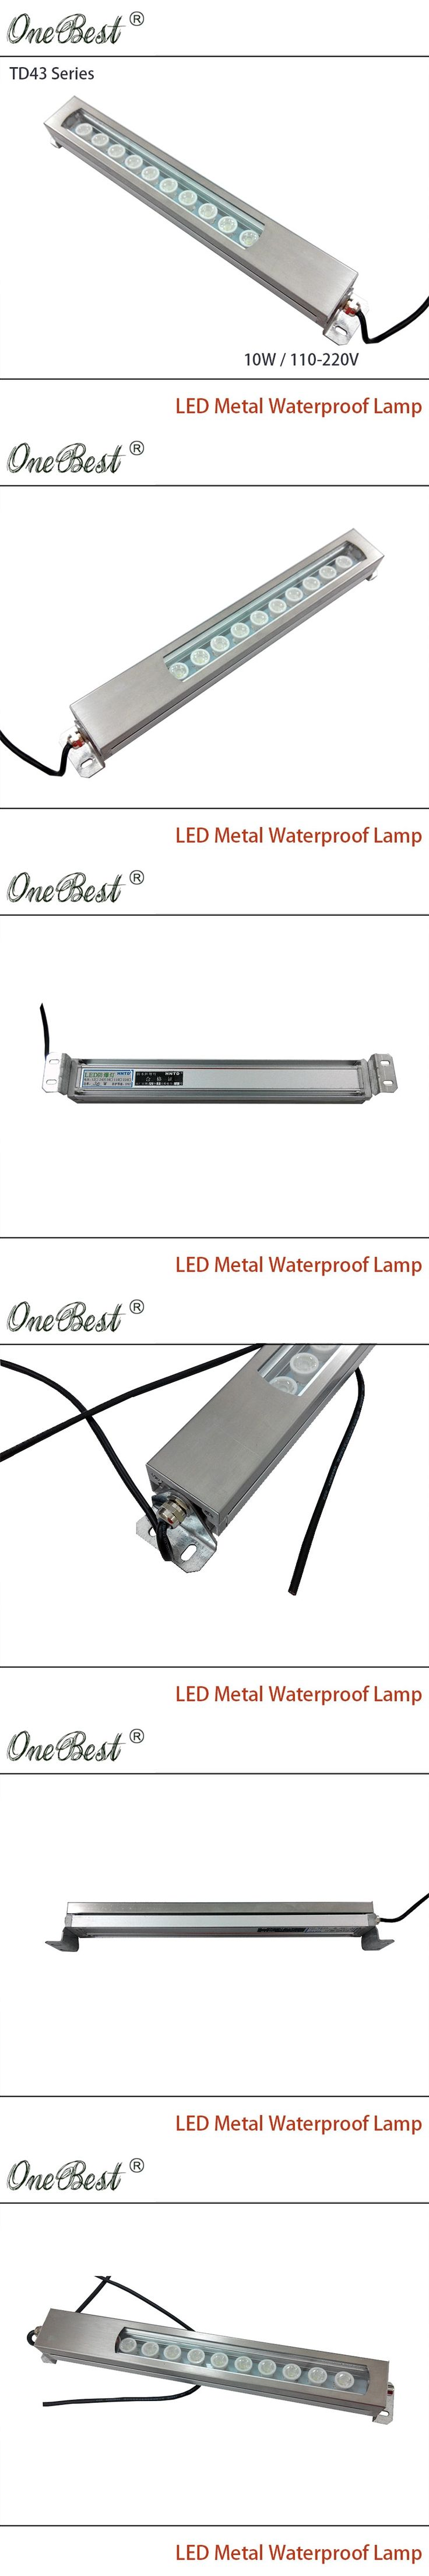 HNTD 10W 110-220V TD43 Led Metal Panel Light CNC Machine Tool Waterproof Explosion-proof Led Spotlight work light Free shipping